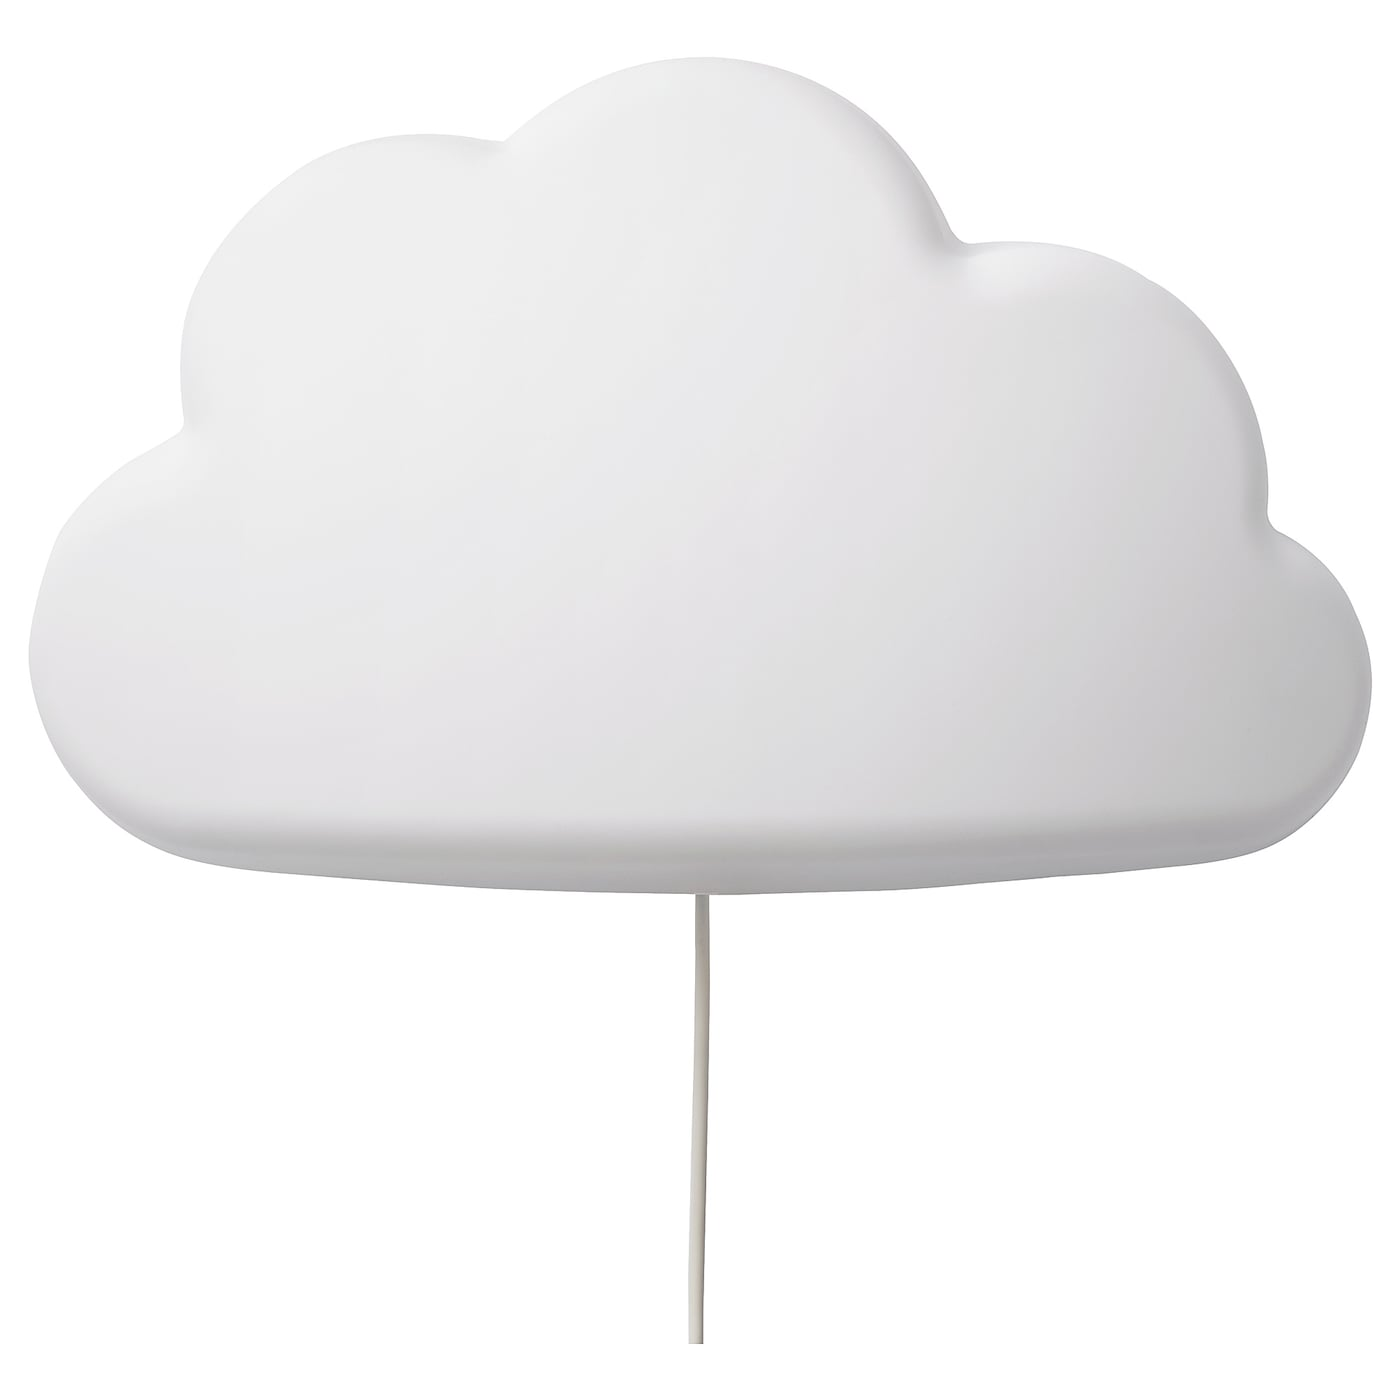 Upplyst Led Wall Lamp Cloud White Ikea